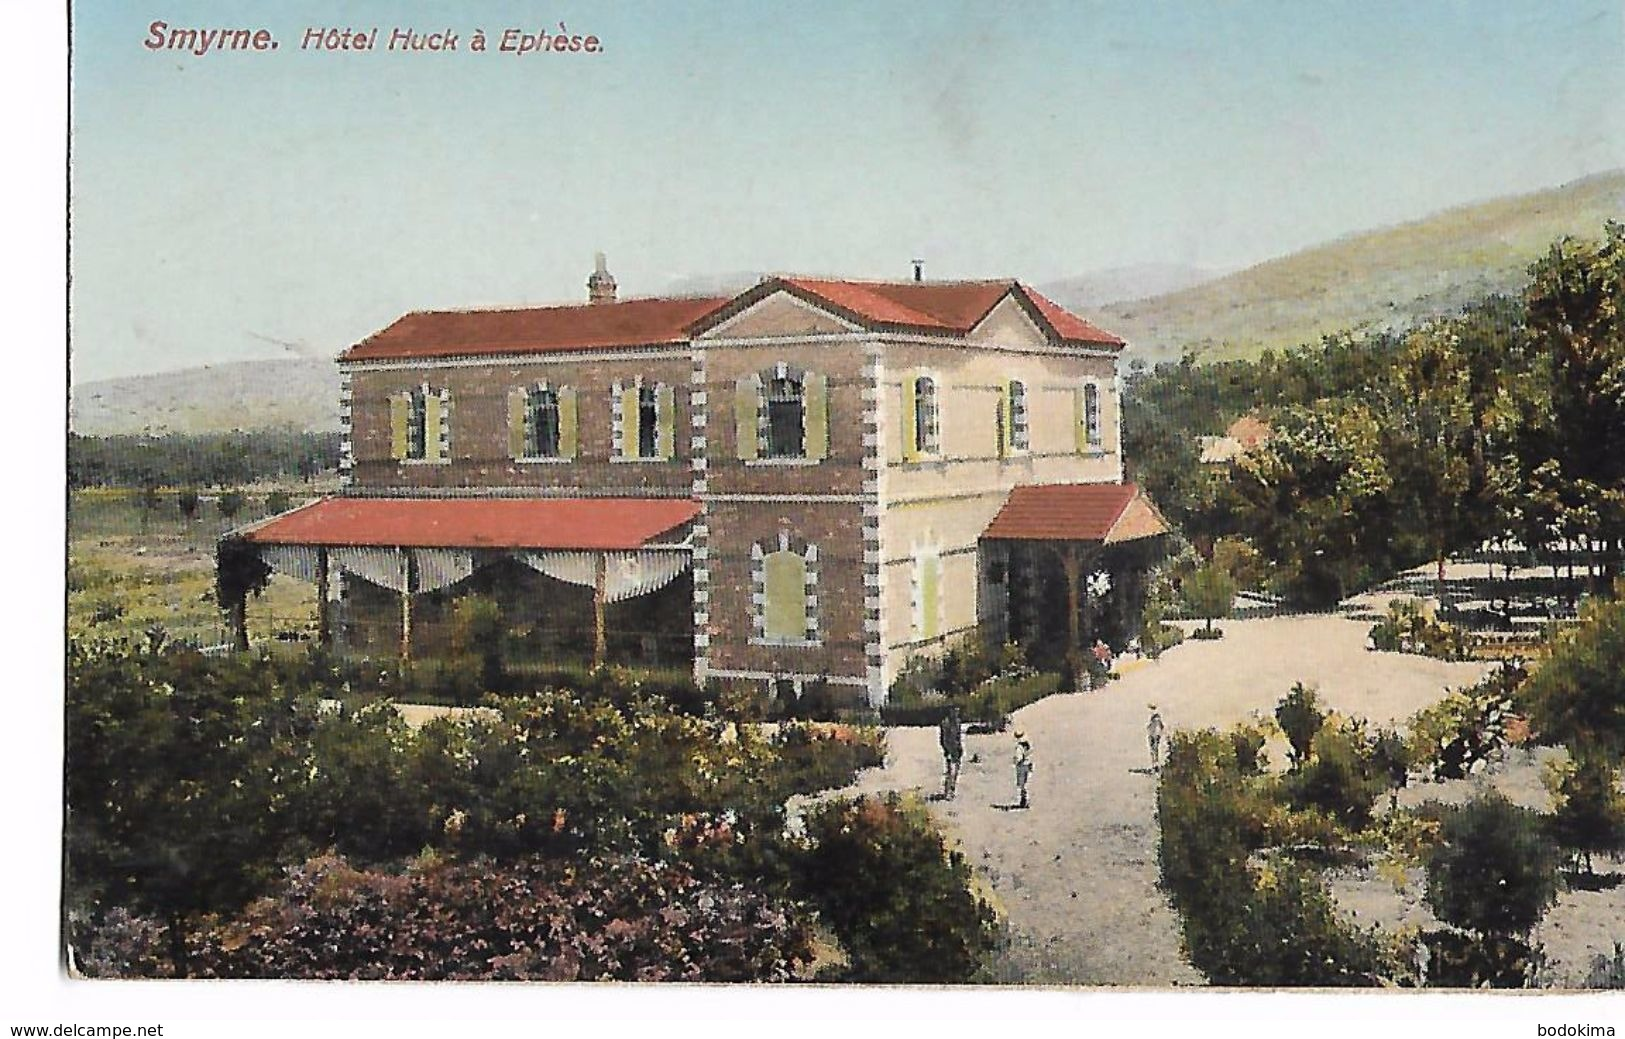 Smyrne  -  Hotel  Huck  à  Ephèse - Turquie